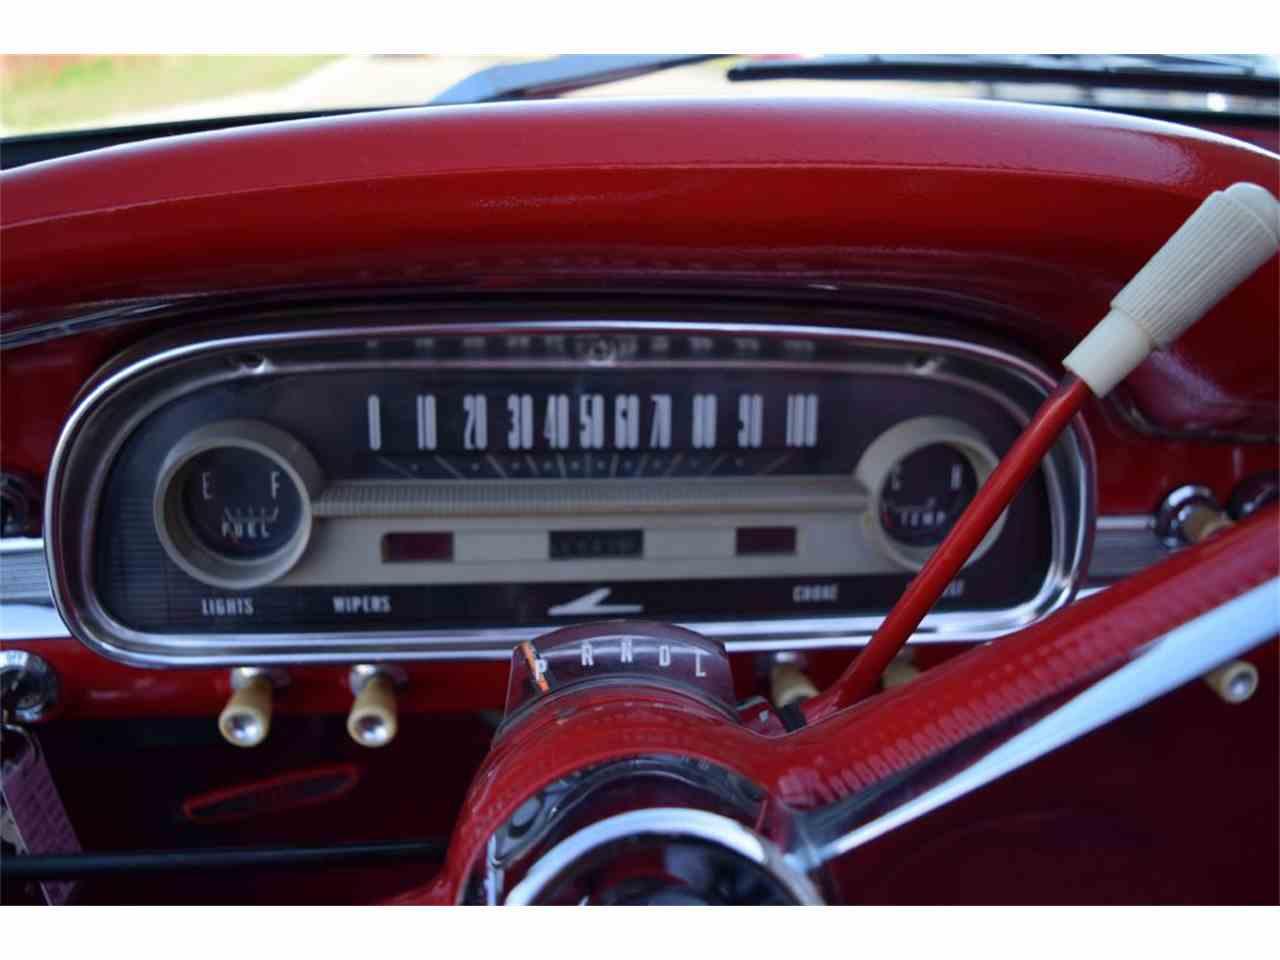 Large Picture of Classic '63 Ford Falcon Futura located in Sioux City Iowa - LUN9